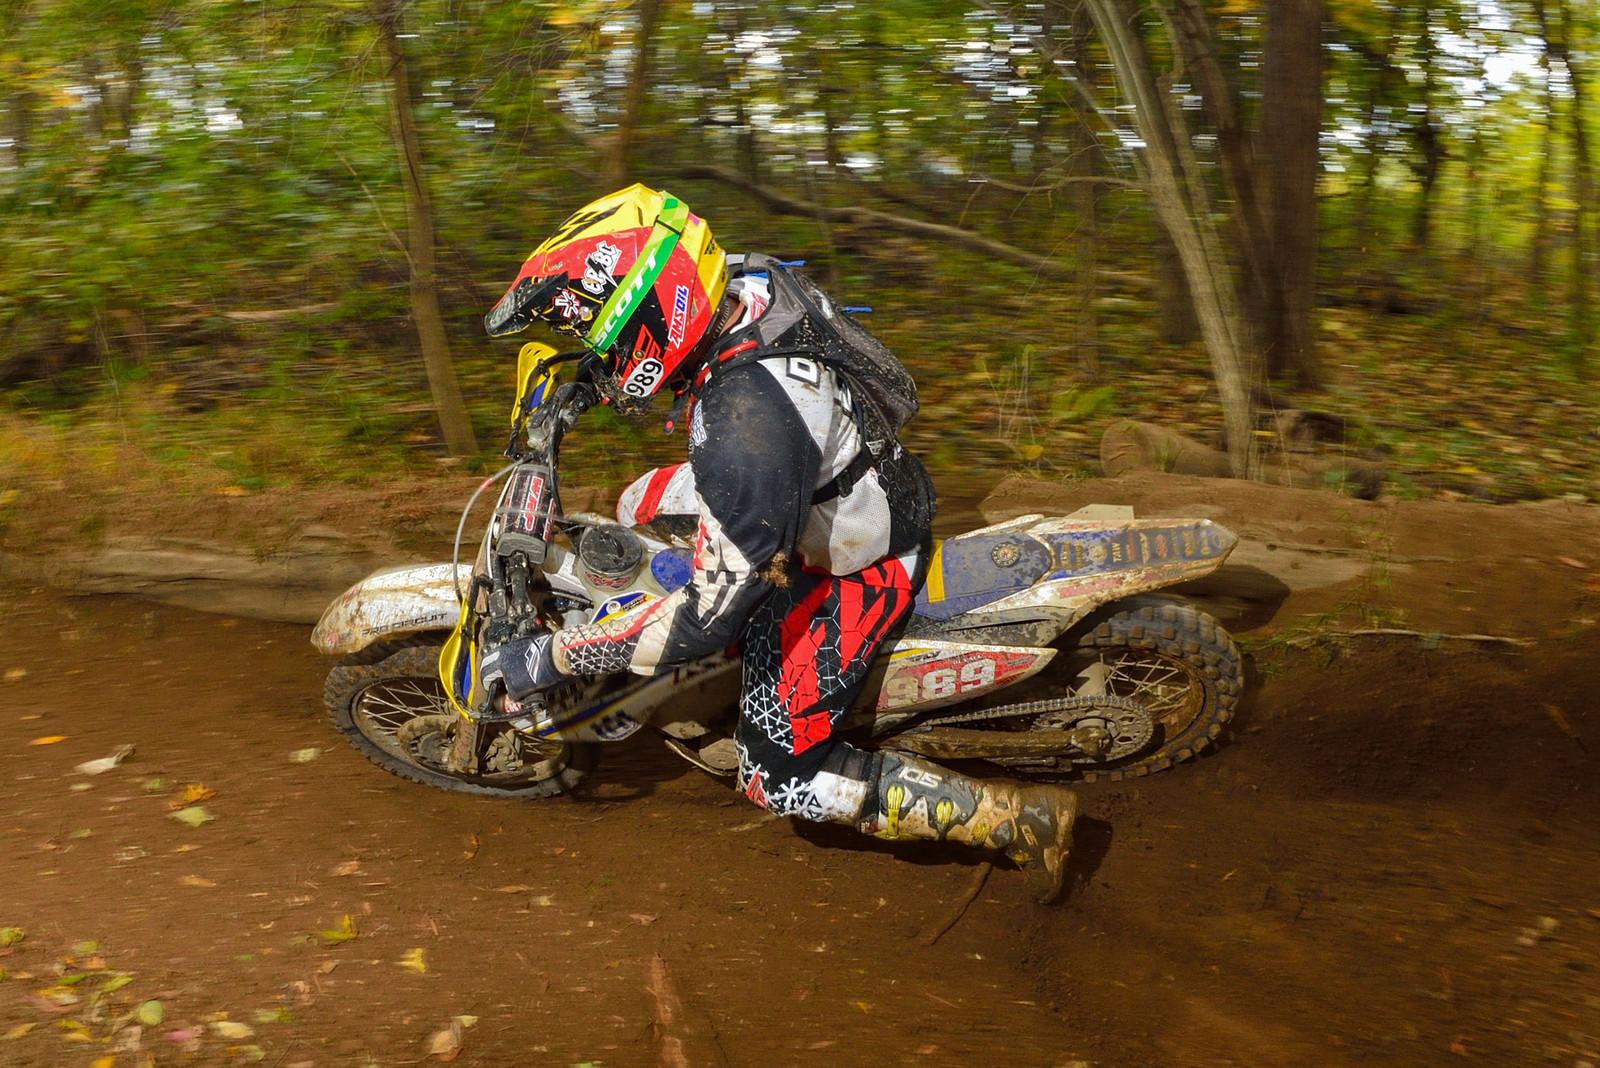 Thad Duvall - Photo Blast: Powerline Park GNCC - Motocross Pictures - Vital MX